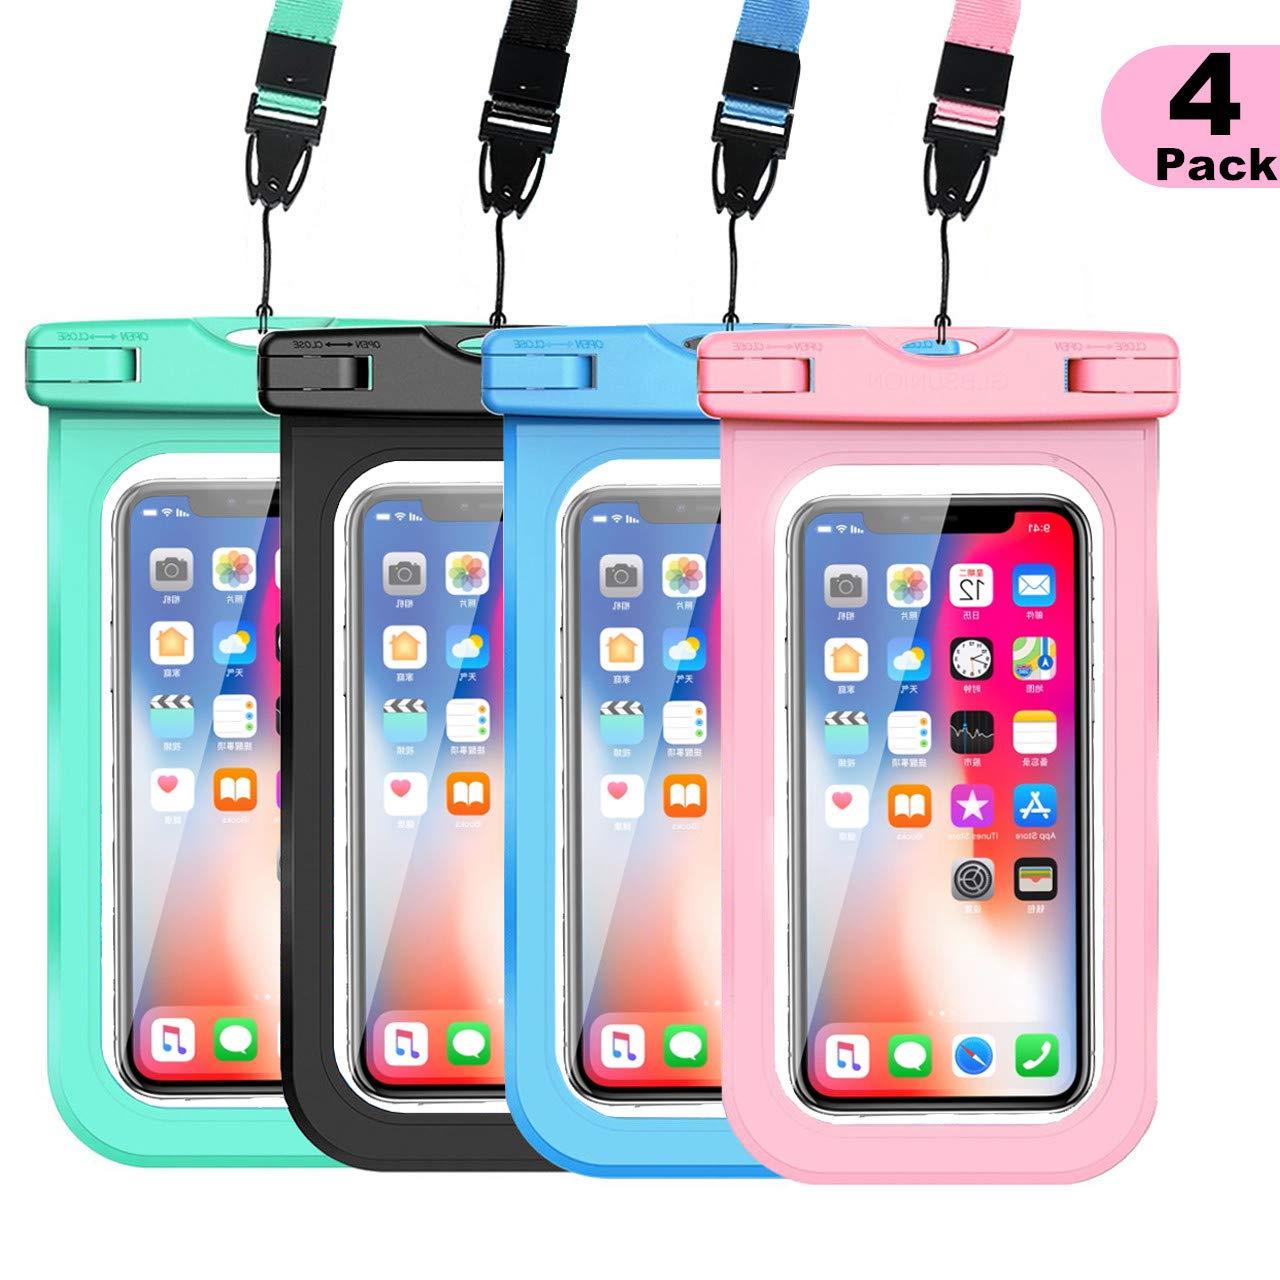 WJZXTEK Universal Waterproof Case,IPX8 Waterproof Phone Pouch Underwater Dry Bag,Compatible iPhone Xs Max/Xr/X/8/8plus/7/7plus Galaxy s9/s8 Note 9/8 Google Pixel up to 6.5''(Black+Pink+Blue+Black) by WJZXTEK